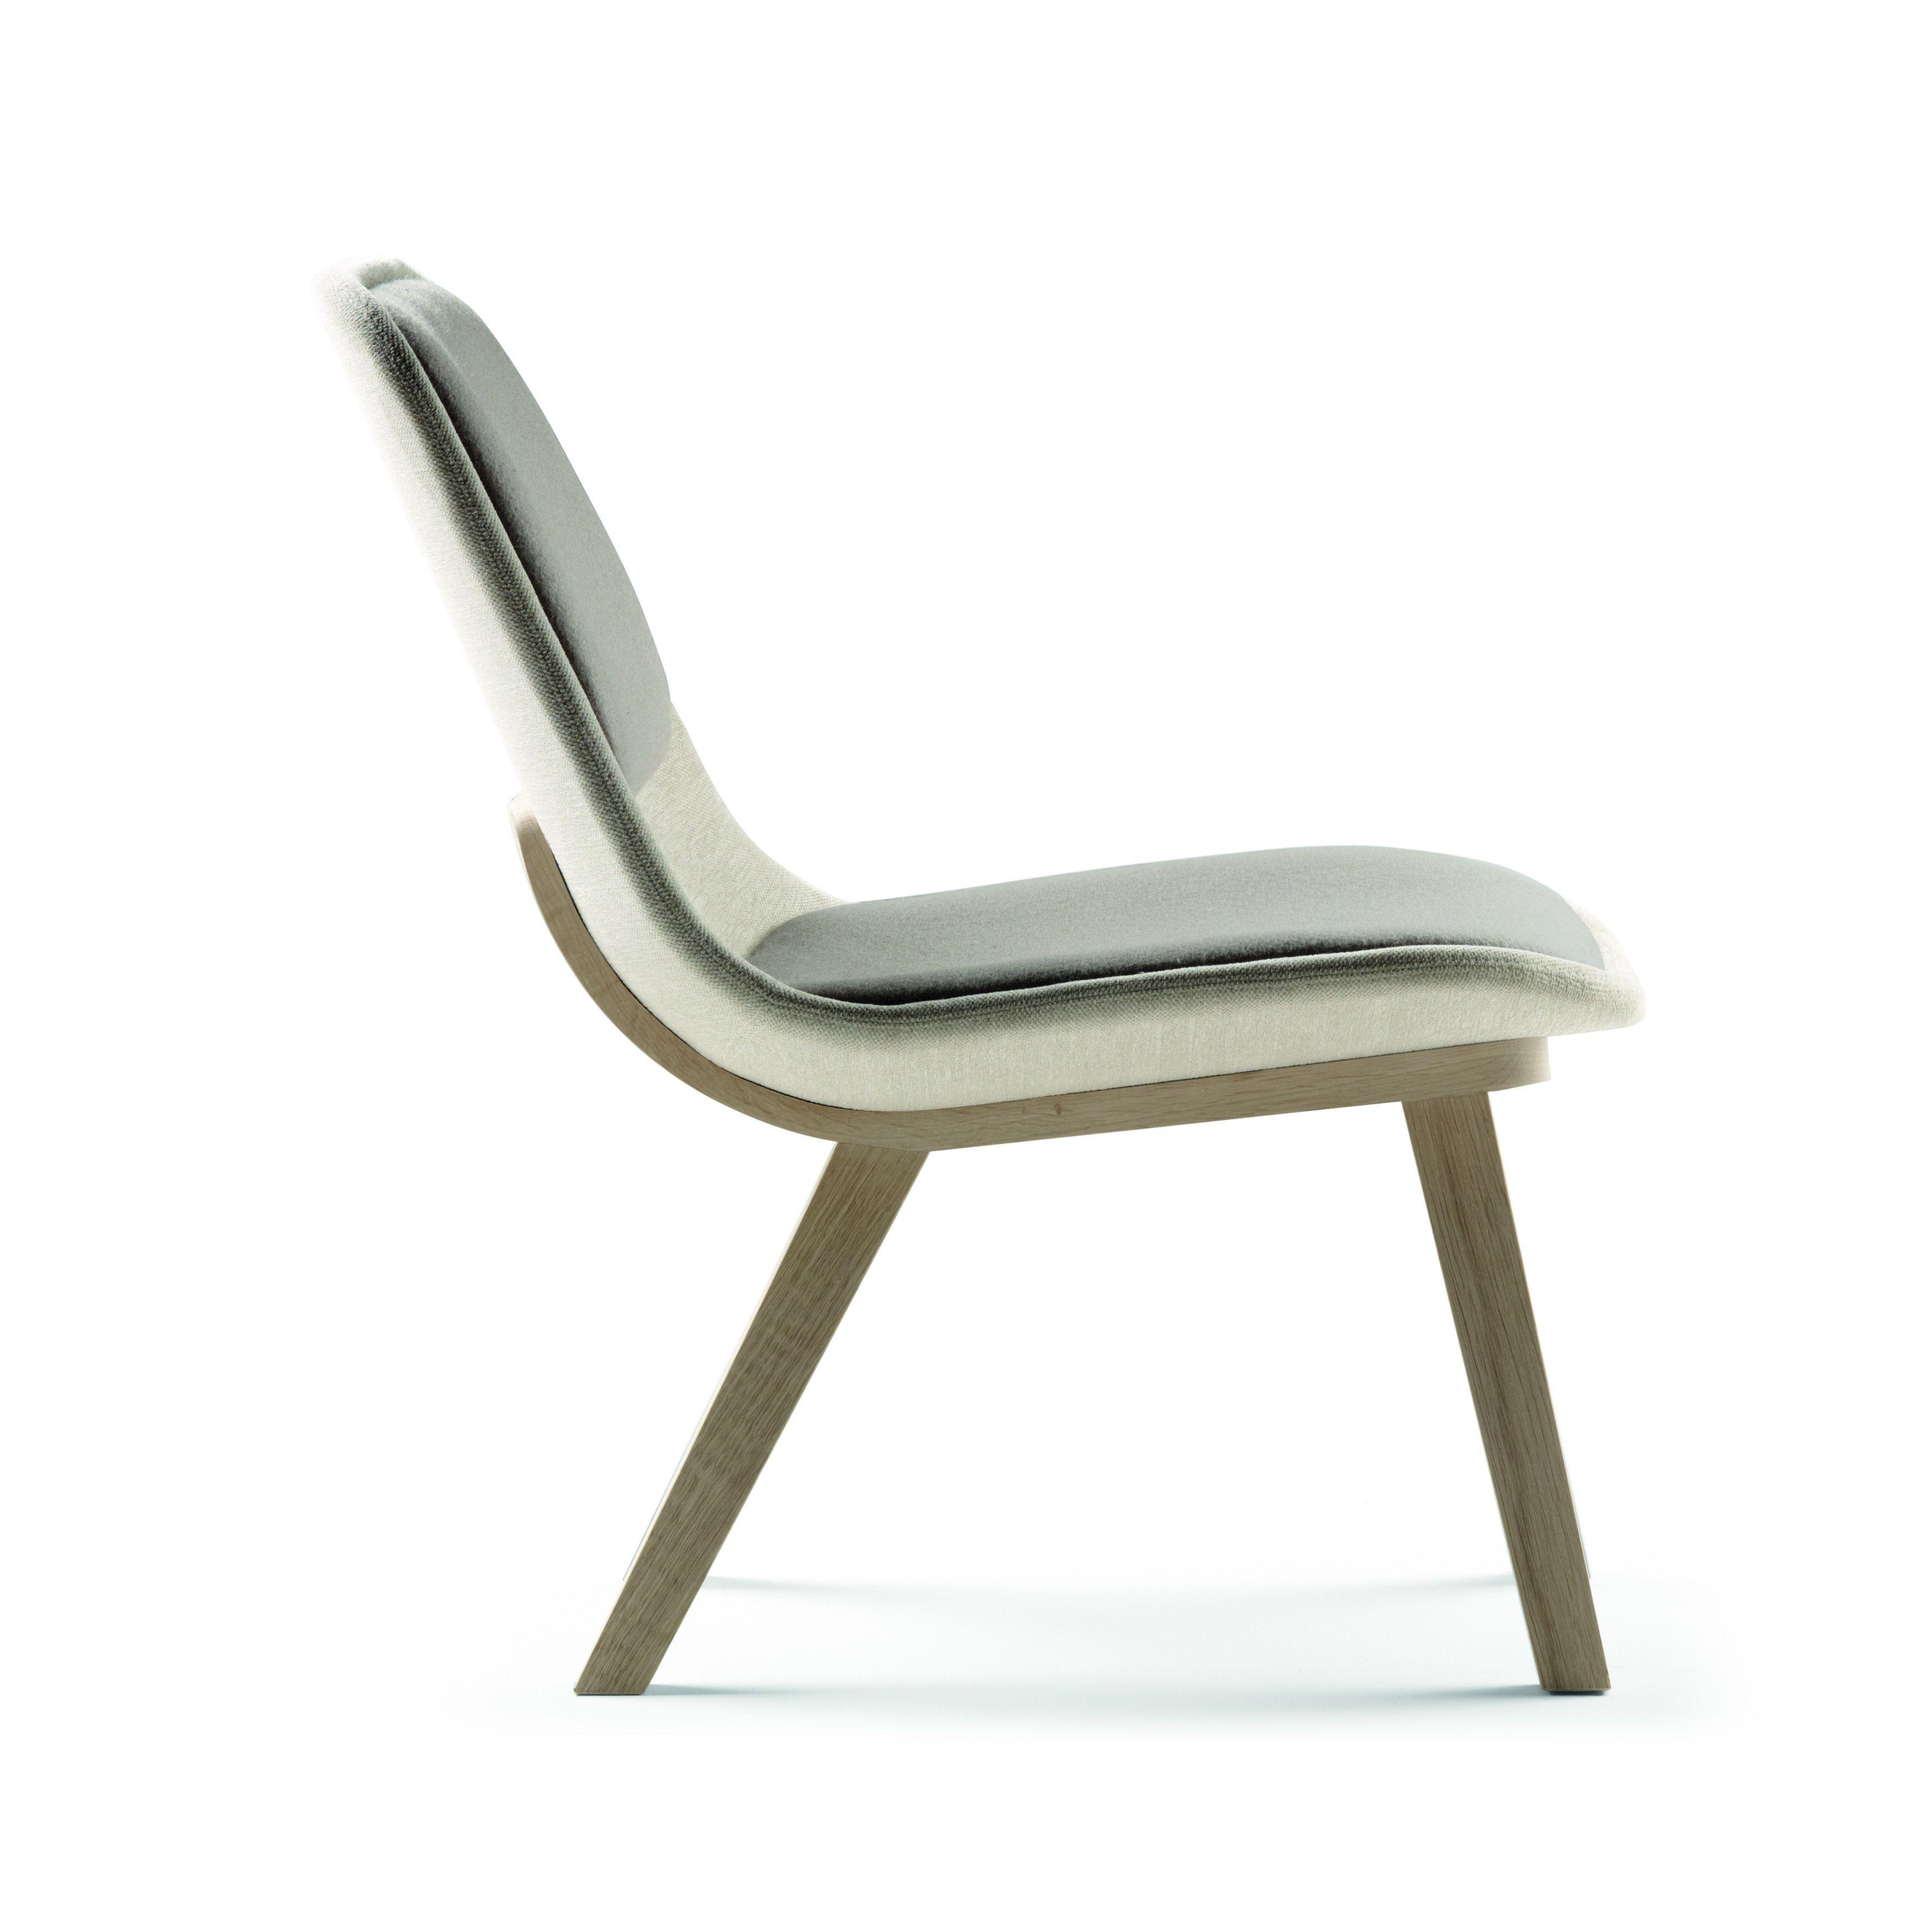 petit fauteuil rembourr en tissu collection kuskoa by alki design jean louis iratzoki. Black Bedroom Furniture Sets. Home Design Ideas